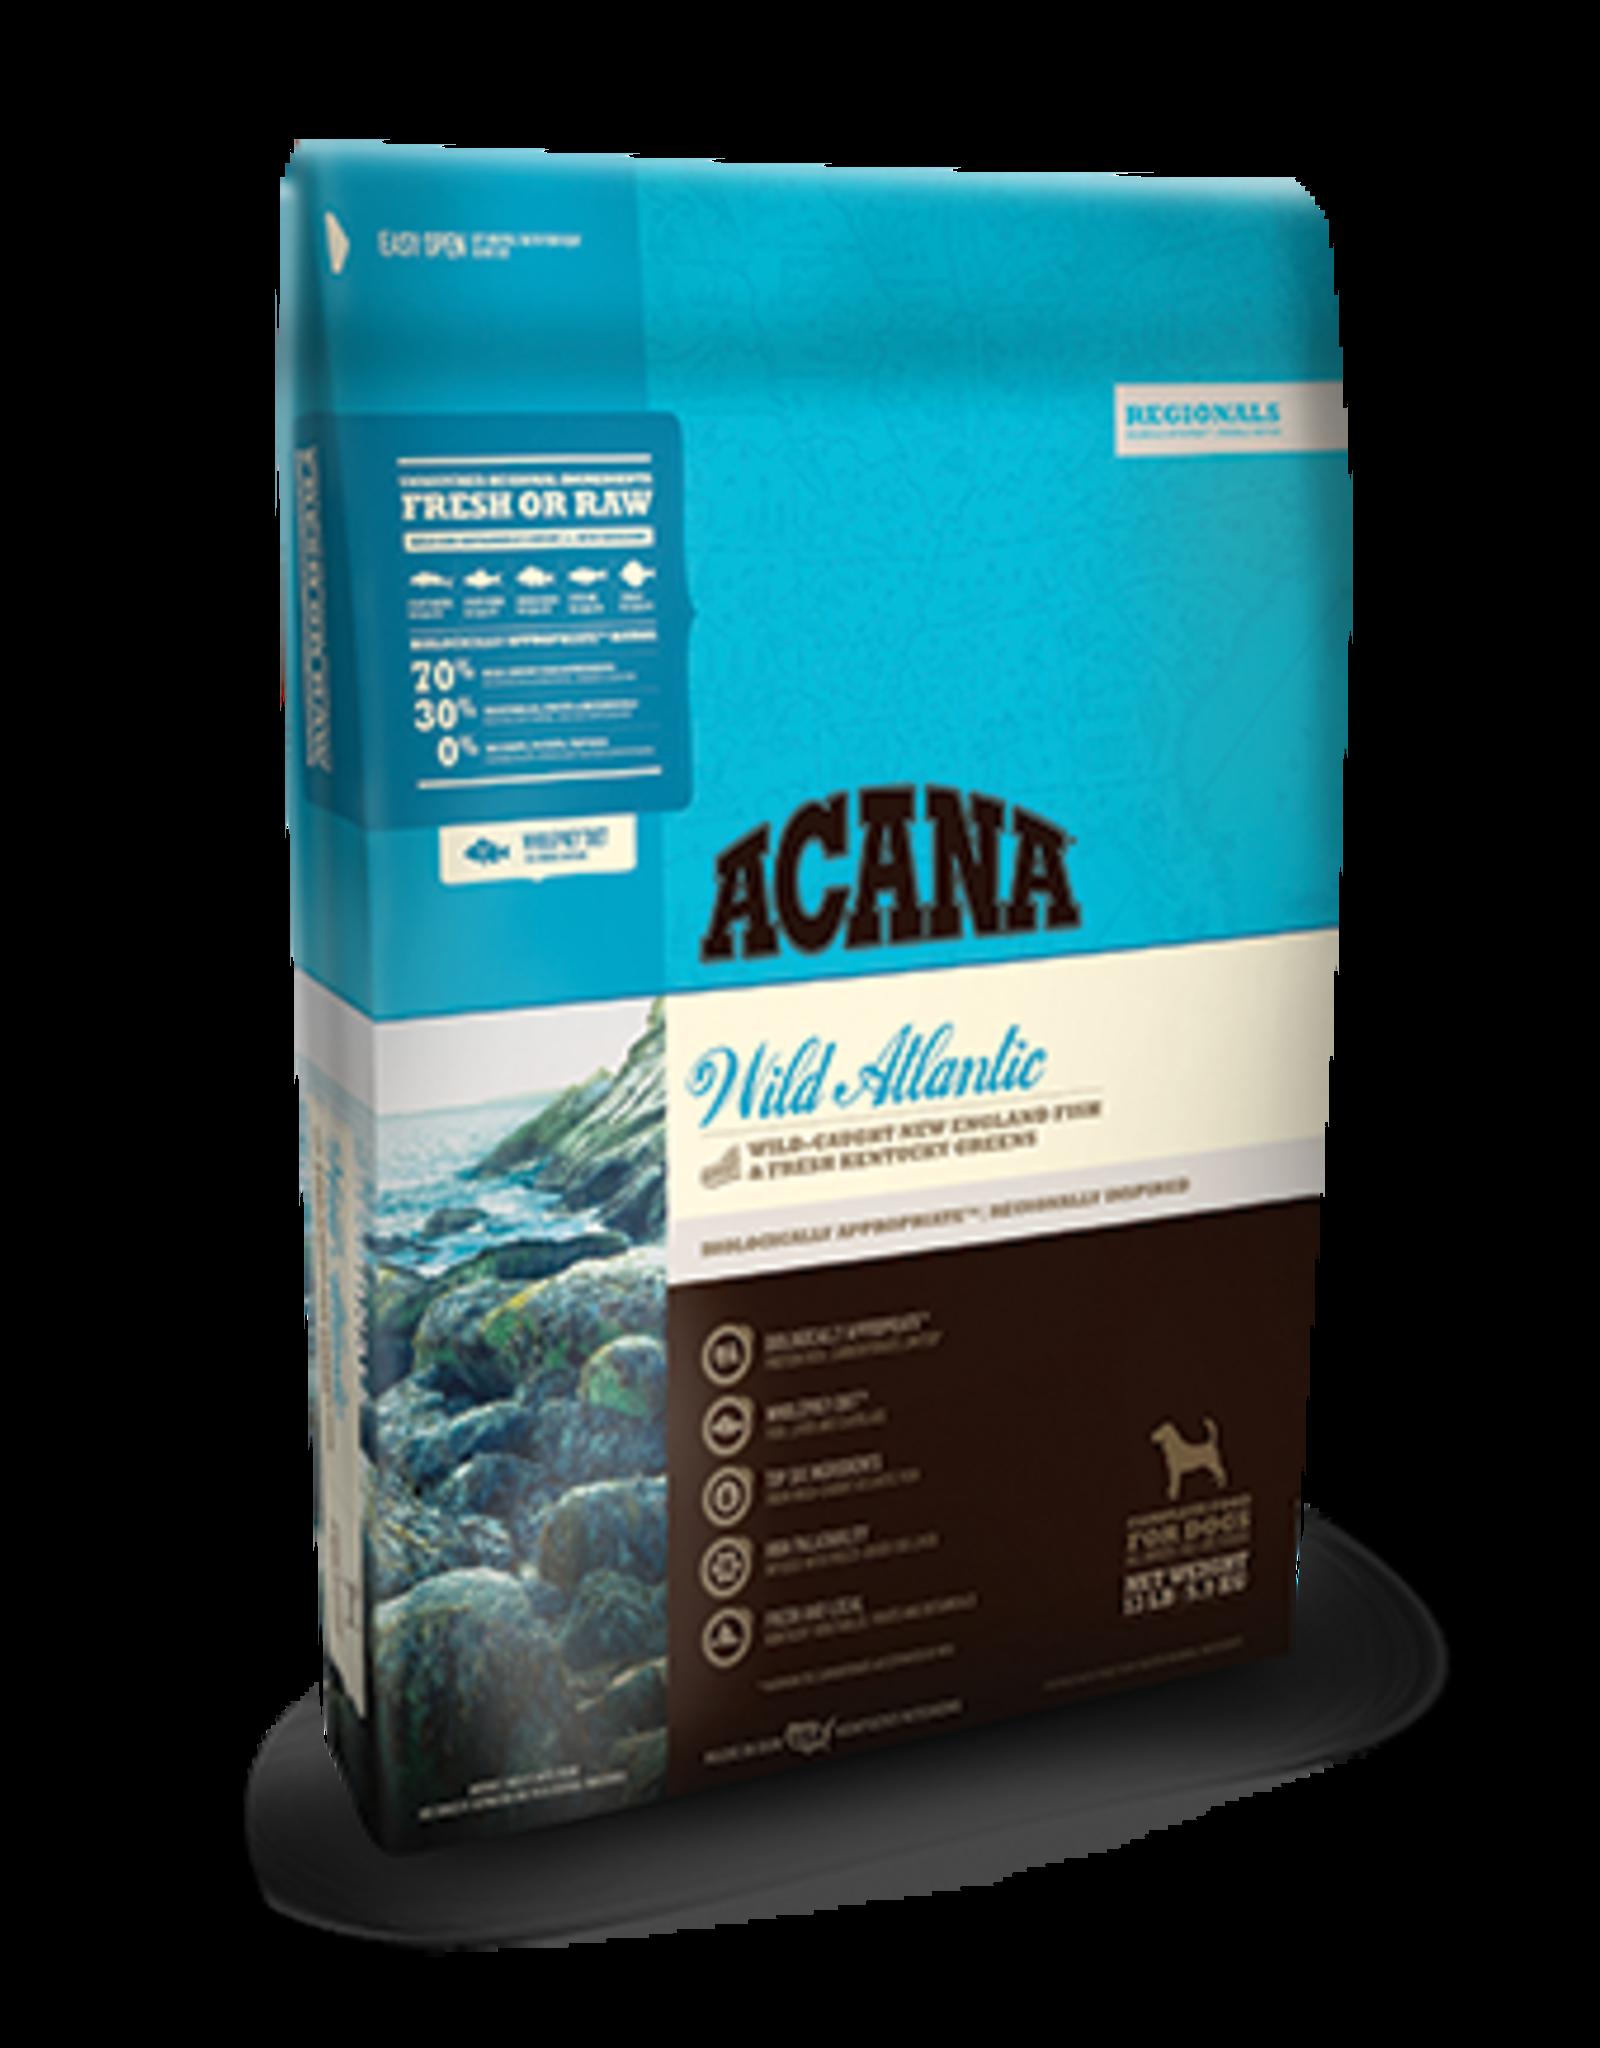 Acana Acana Regionals Dog Food Wild Atlantic